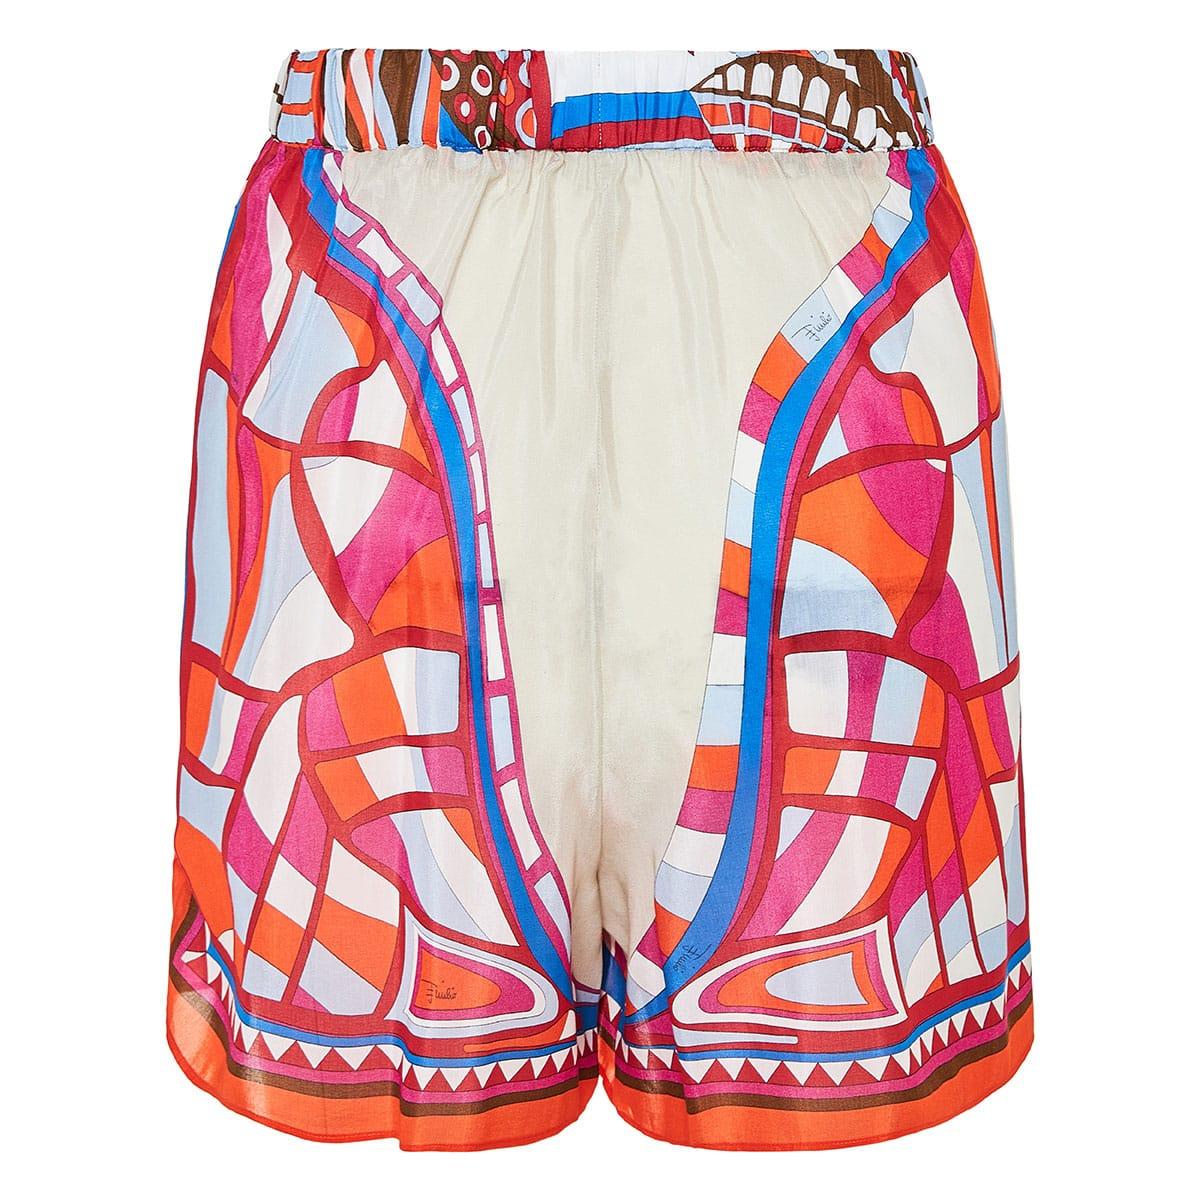 Corisco print layered knotted shorts